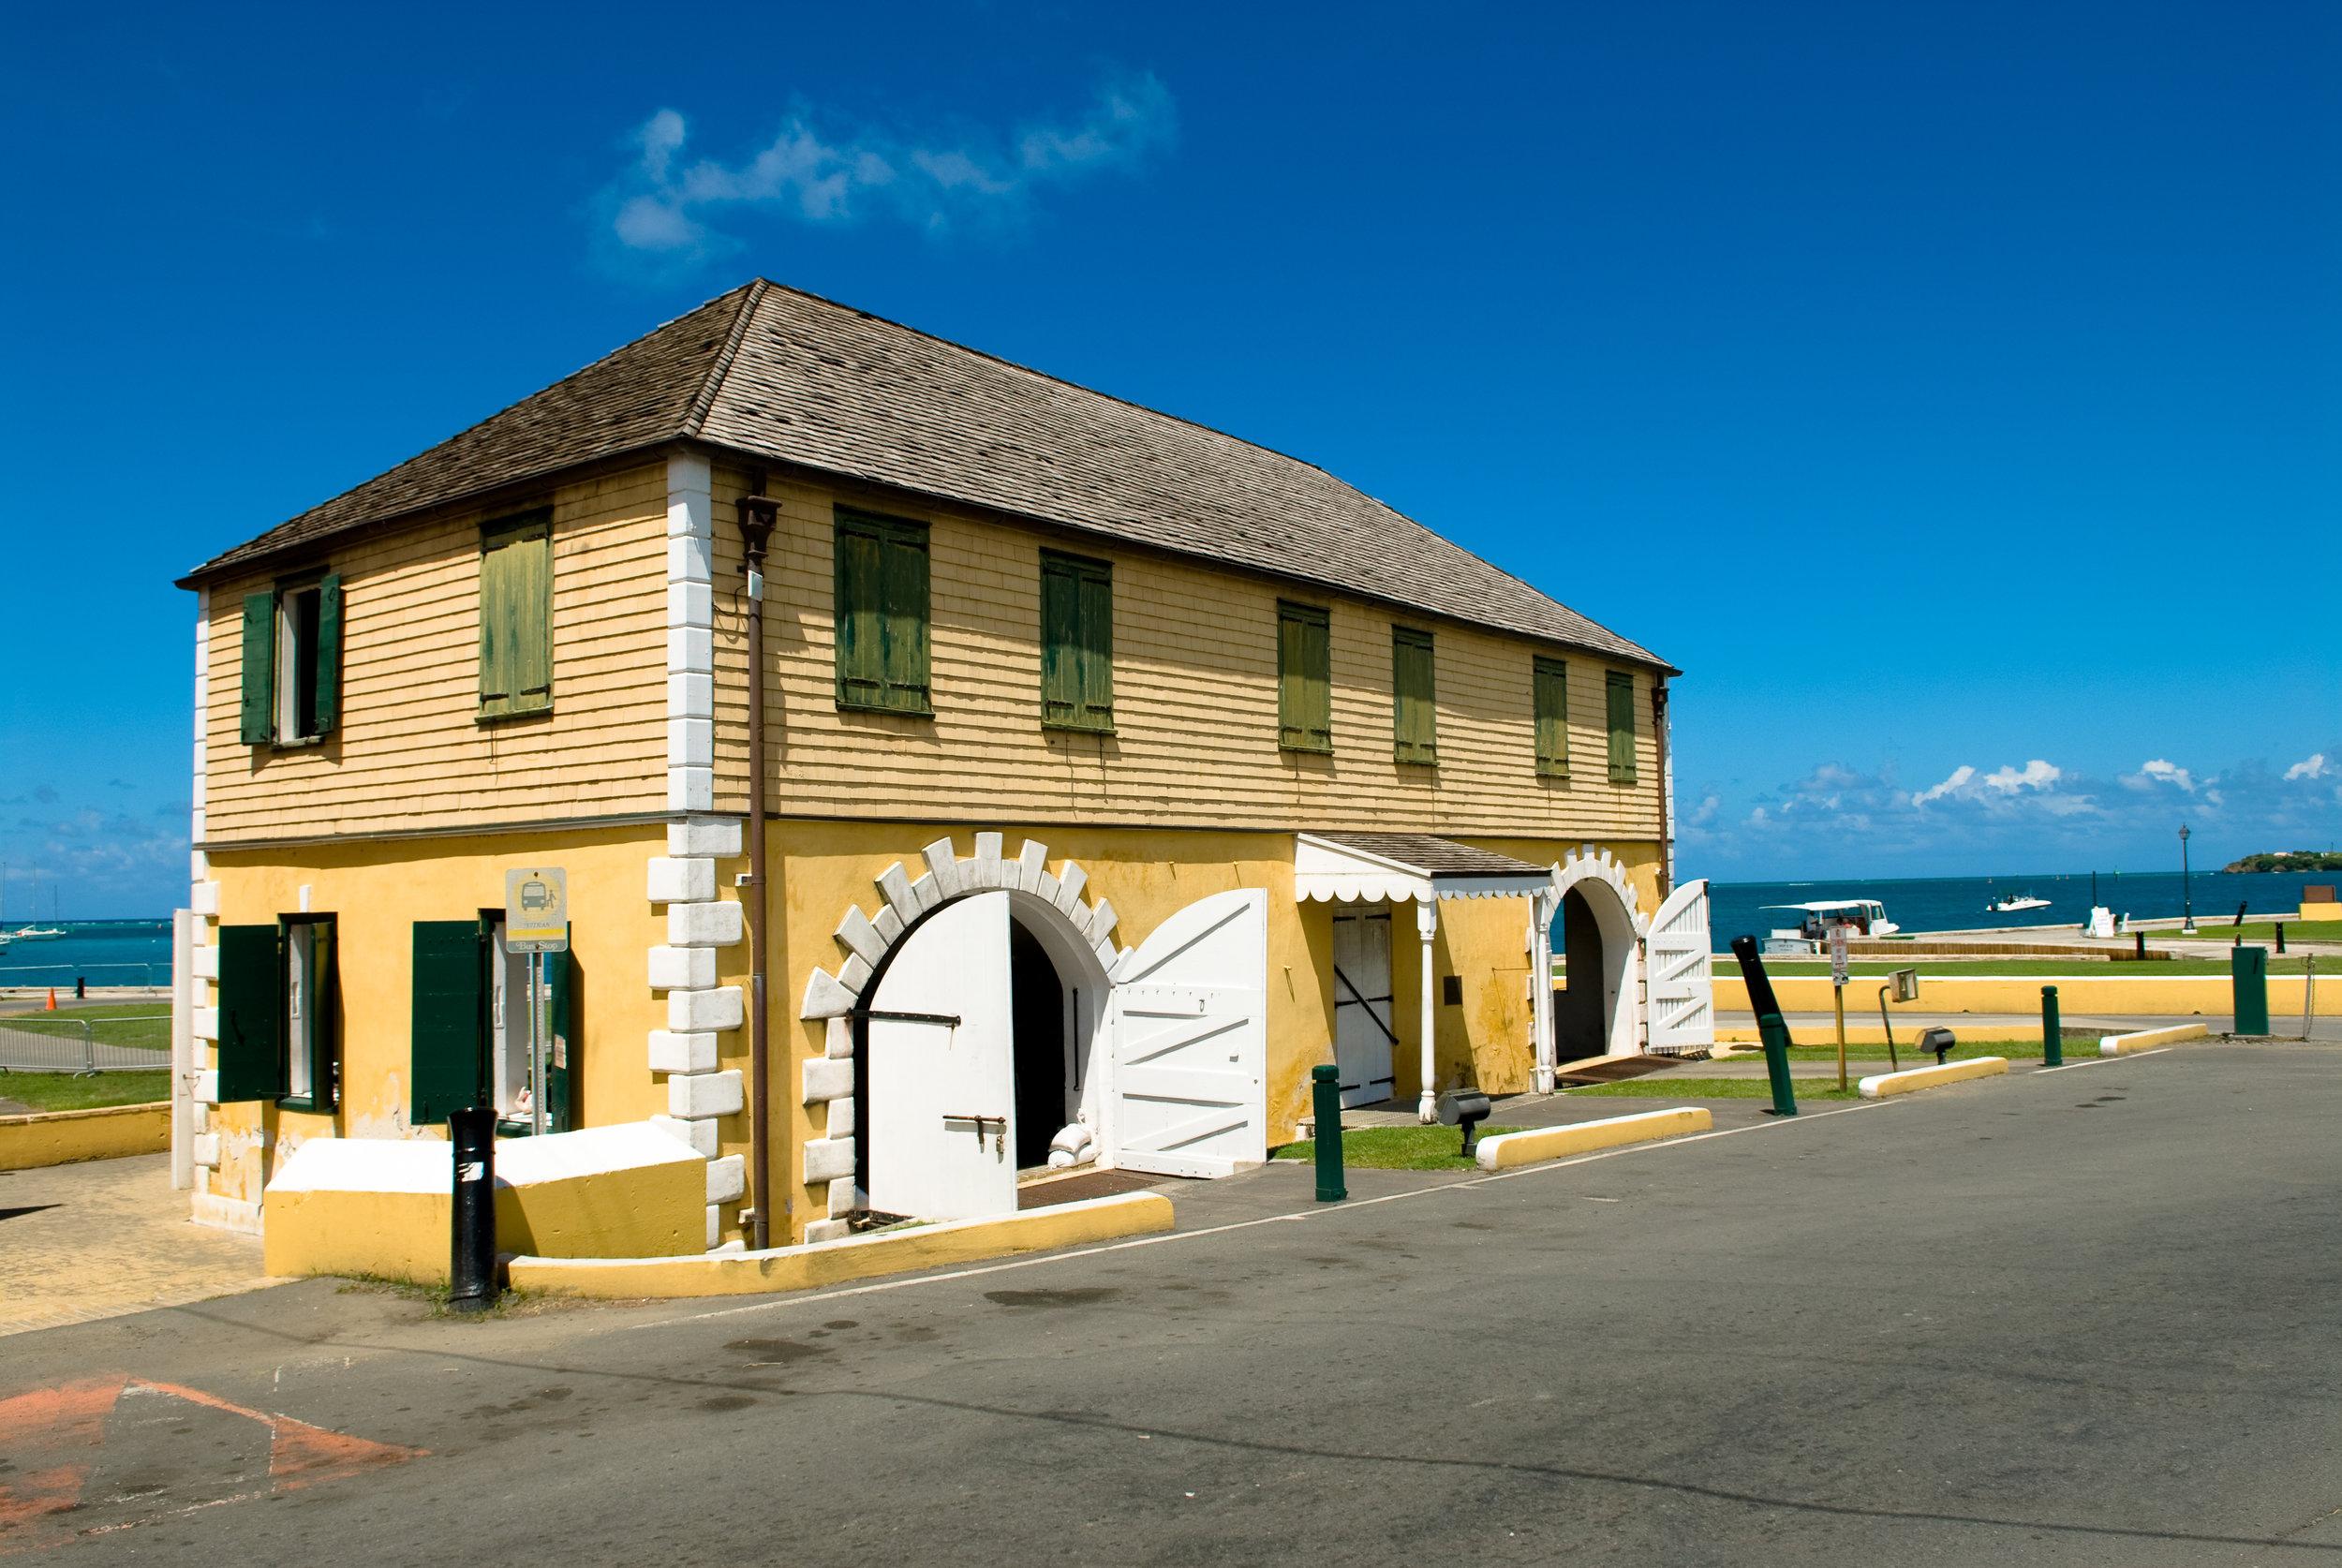 Virgin_Islands-5.jpg